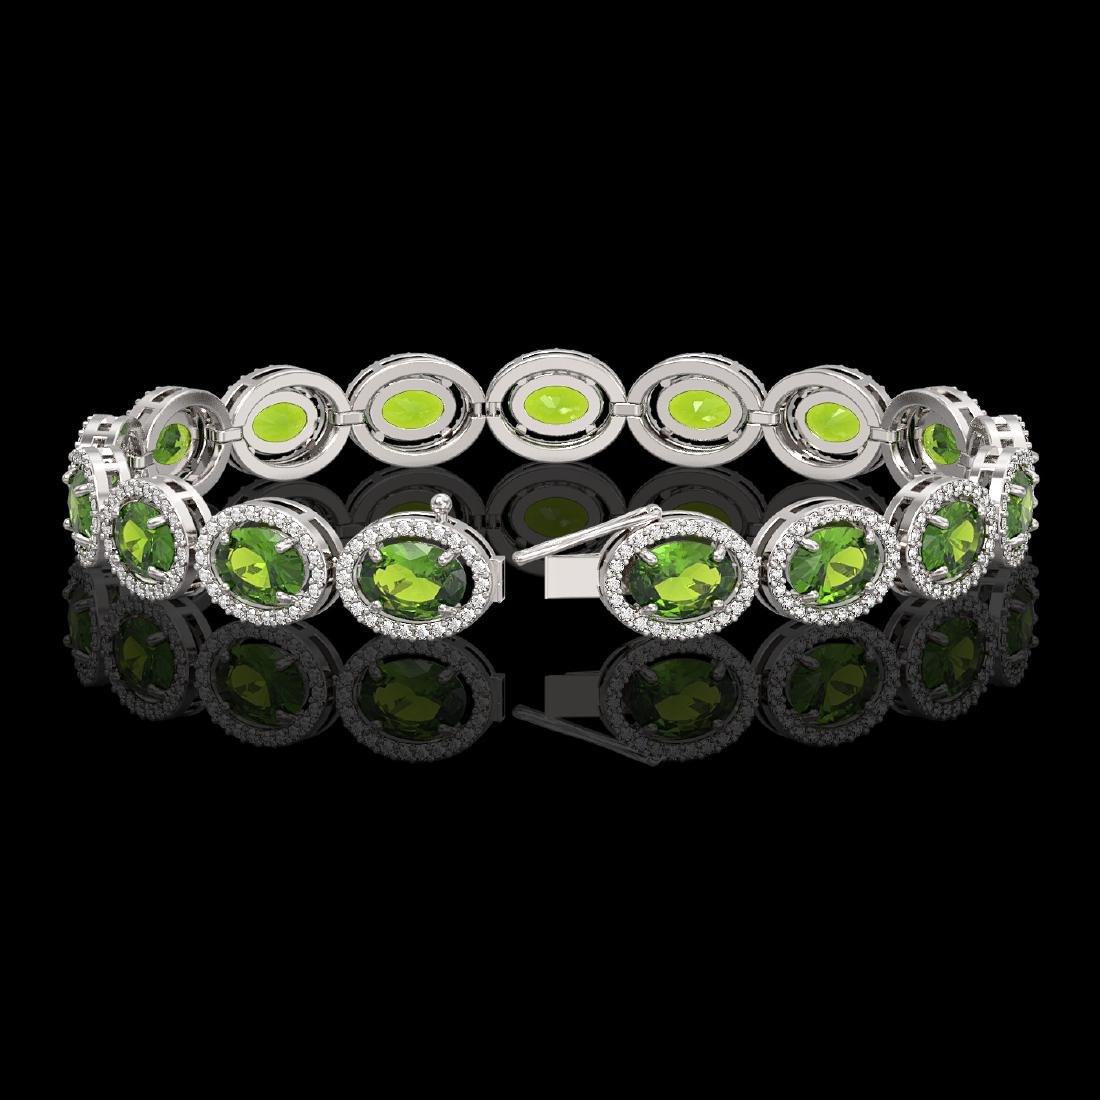 21.13 CTW Peridot & Diamond Halo Bracelet 10K White - 2